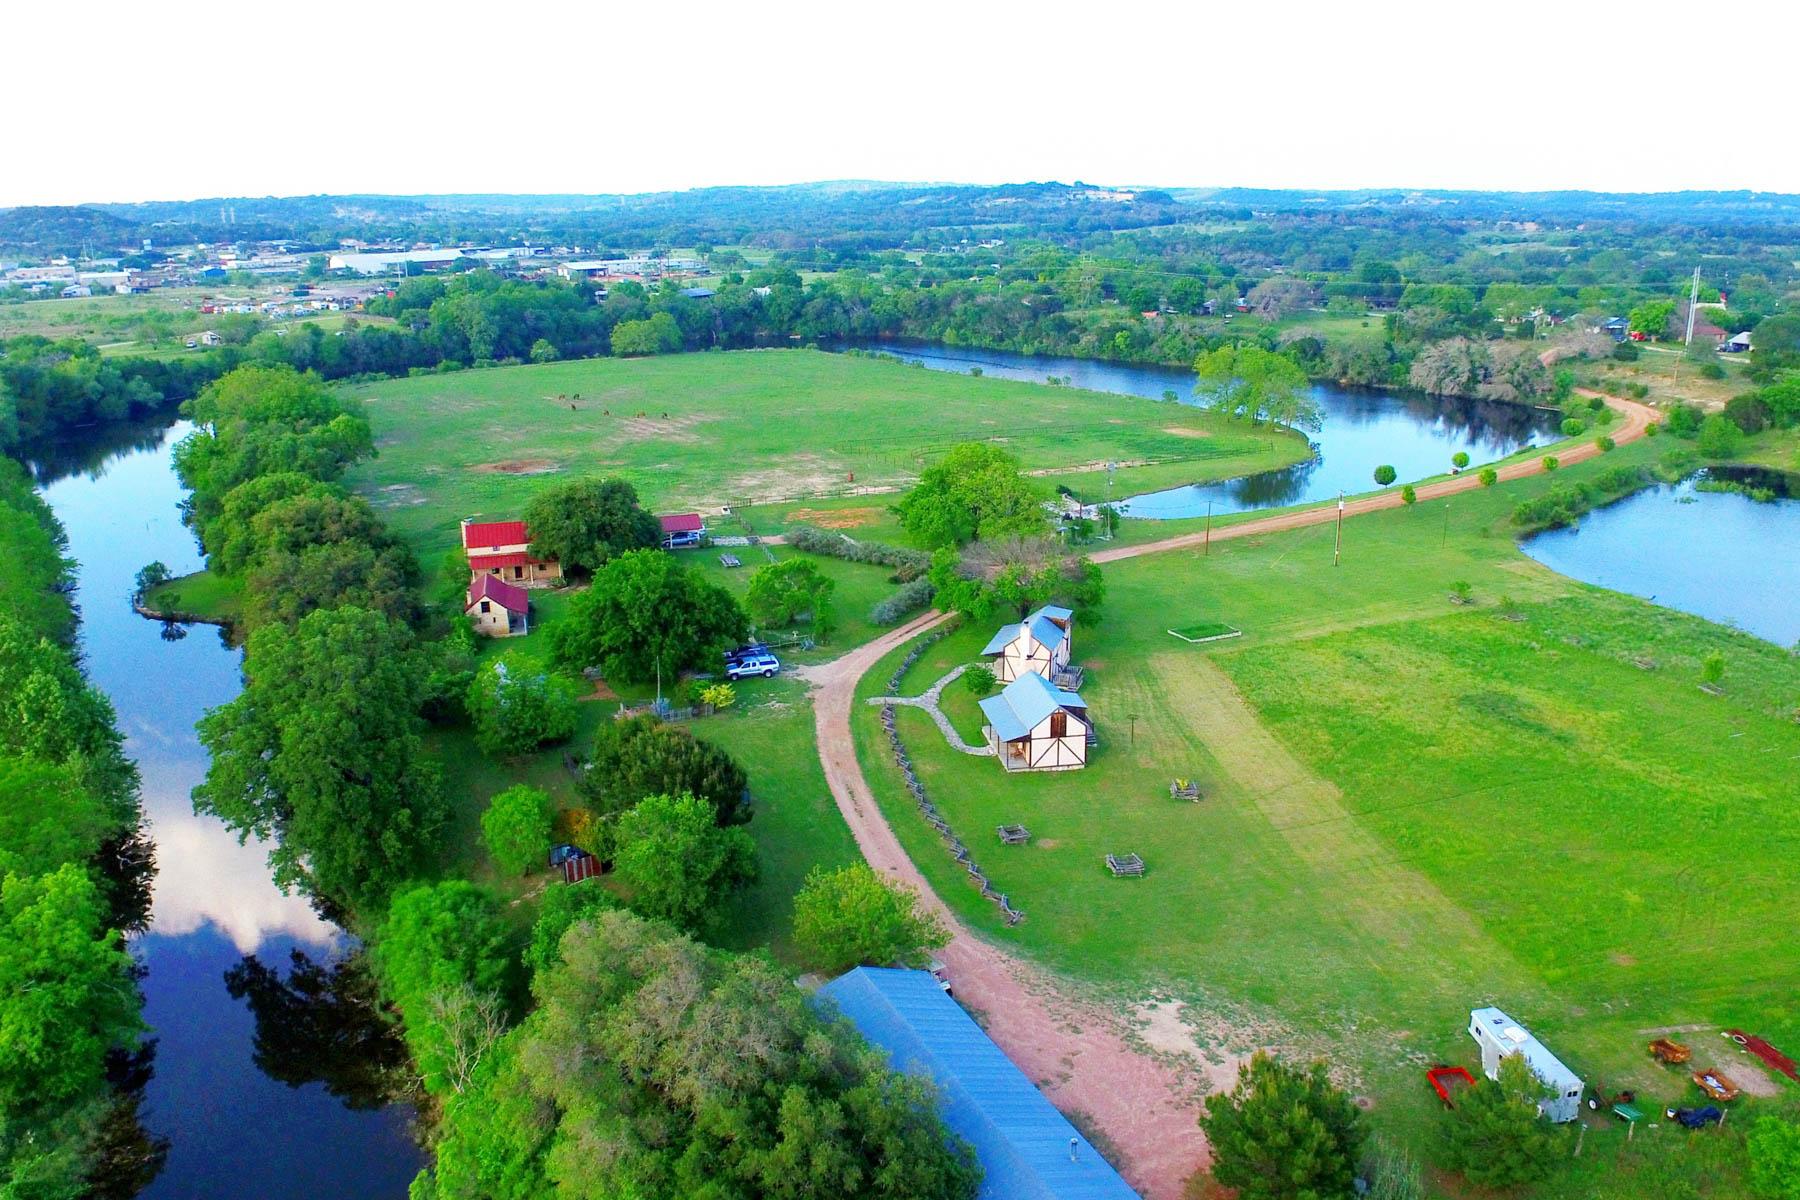 Single Family Home for Sale at Amazing Fredericksburg Property on 36-/+ Acres 457 Bob Moritz Fredericksburg, Texas 78624 United States